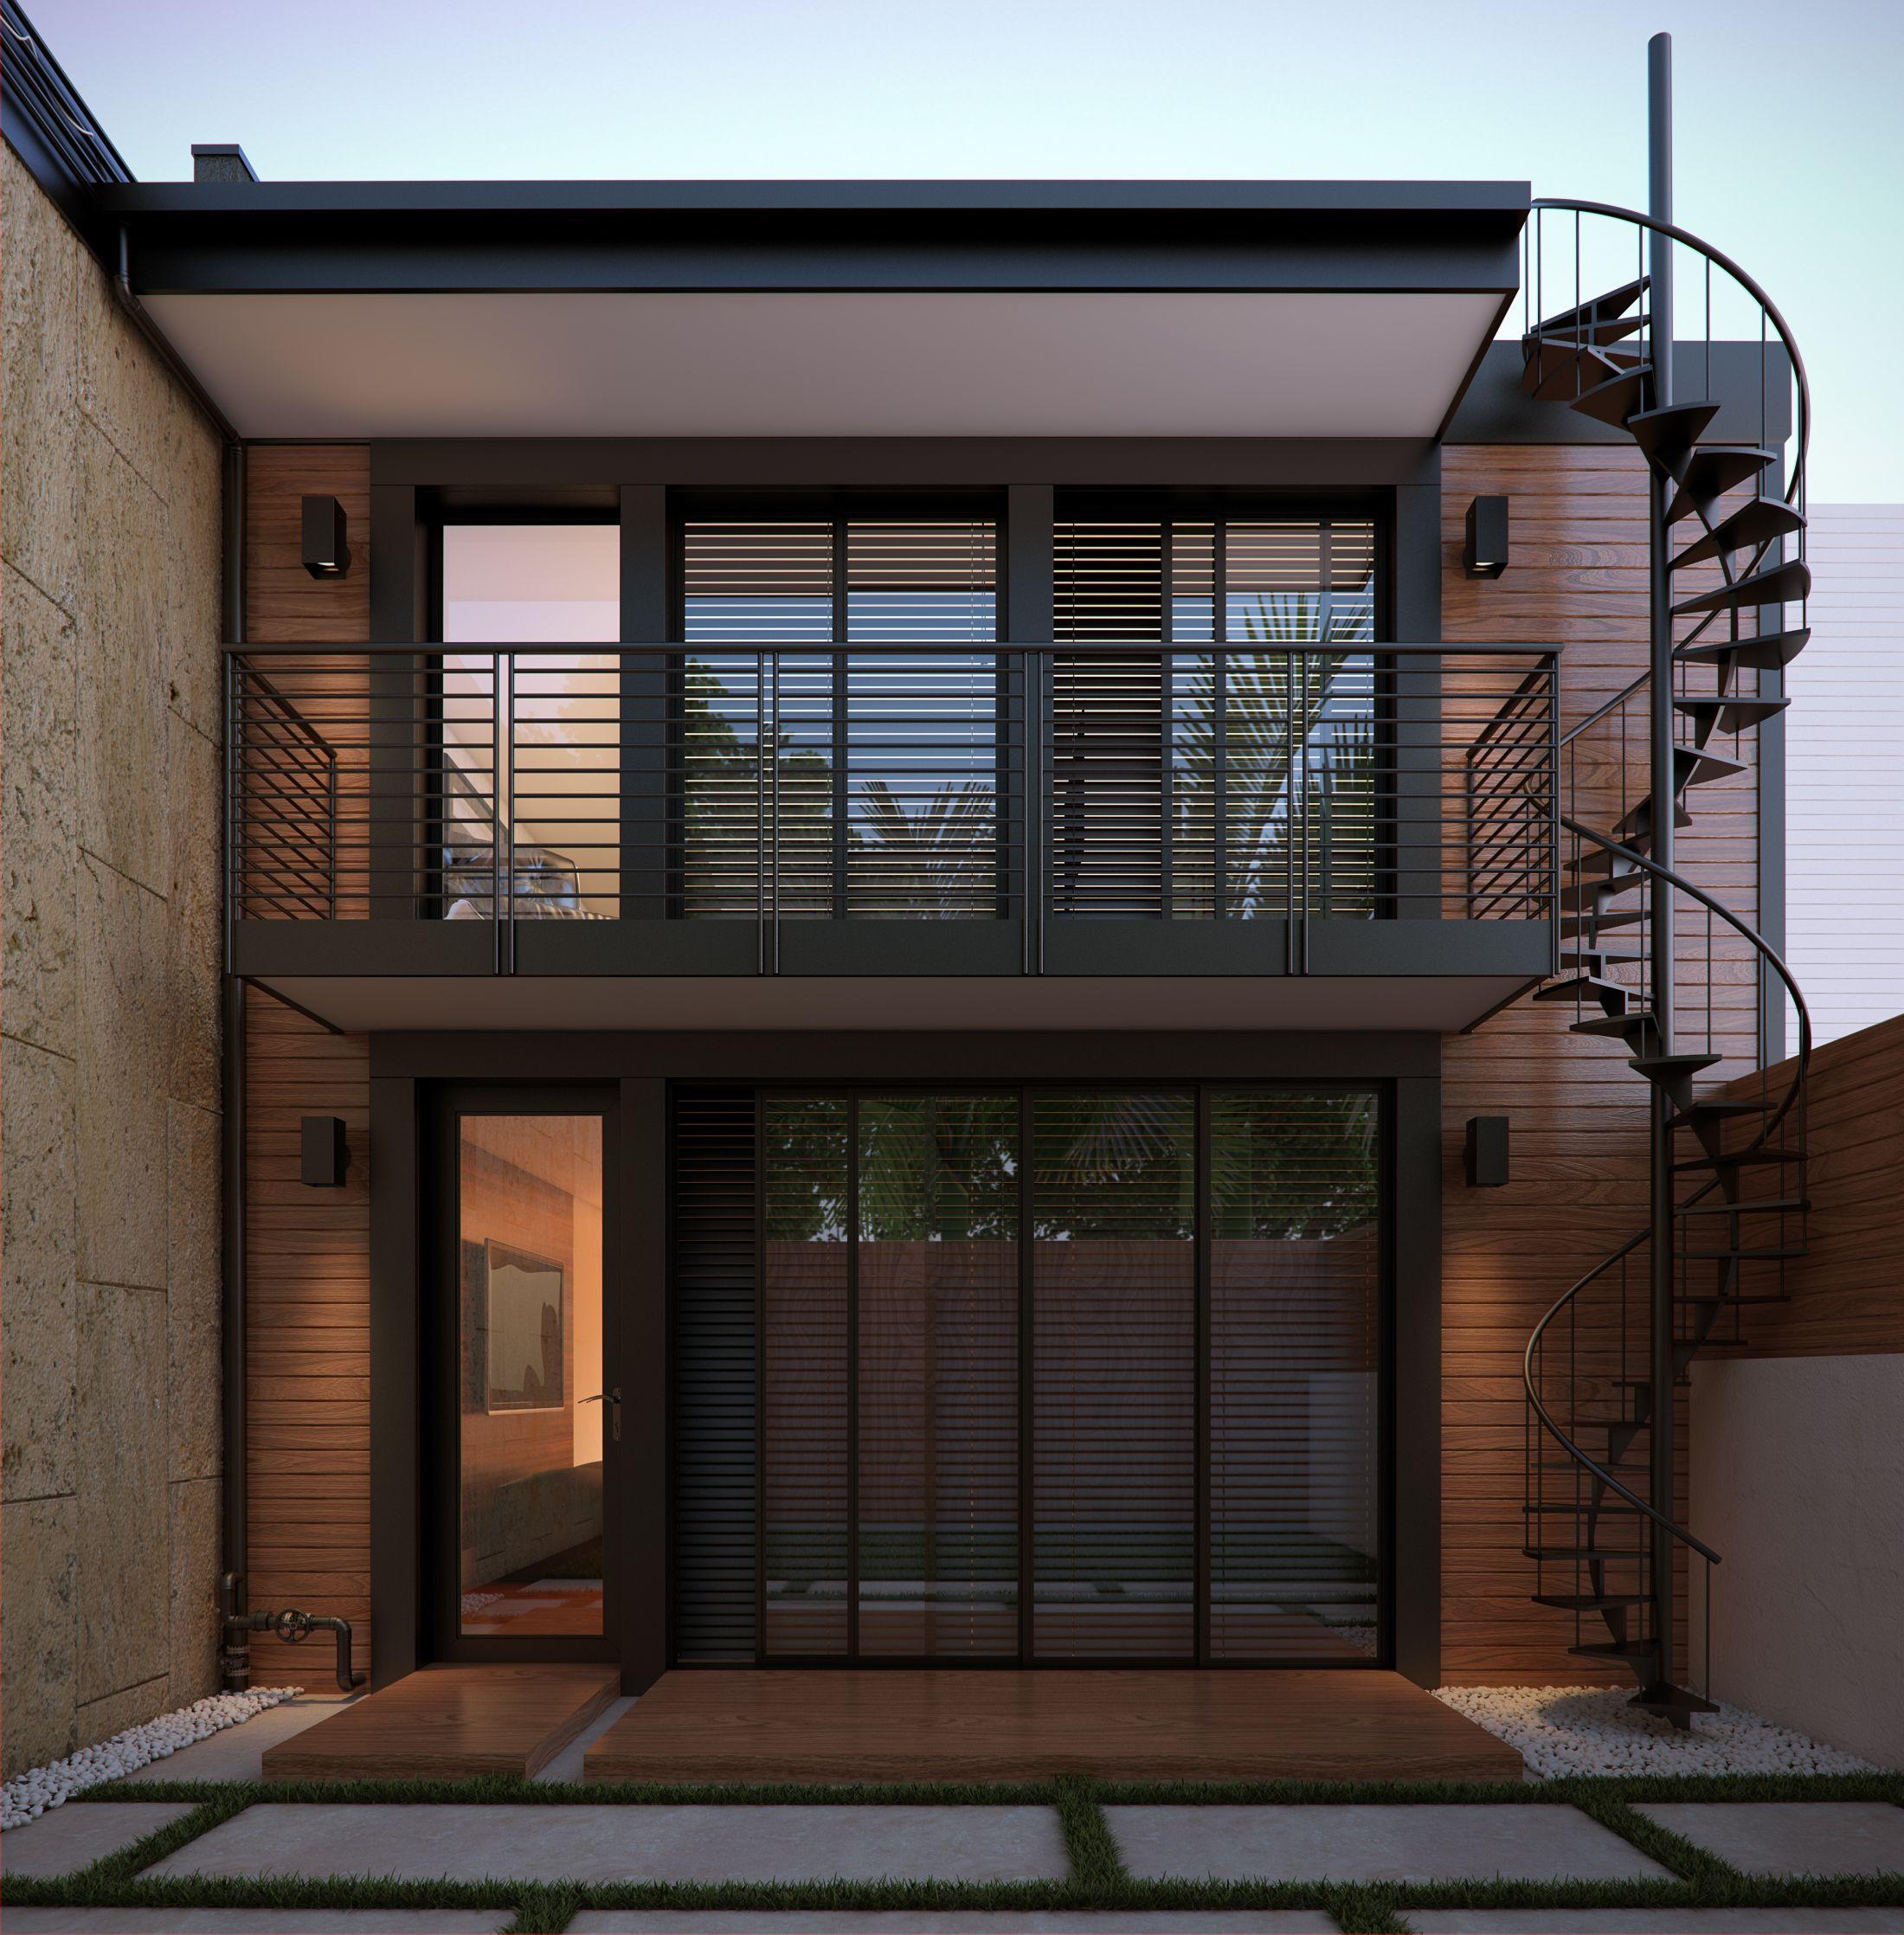 Portfolio Modern Home Design: {E}vermotion - Portfolio By Rafharh In 2019